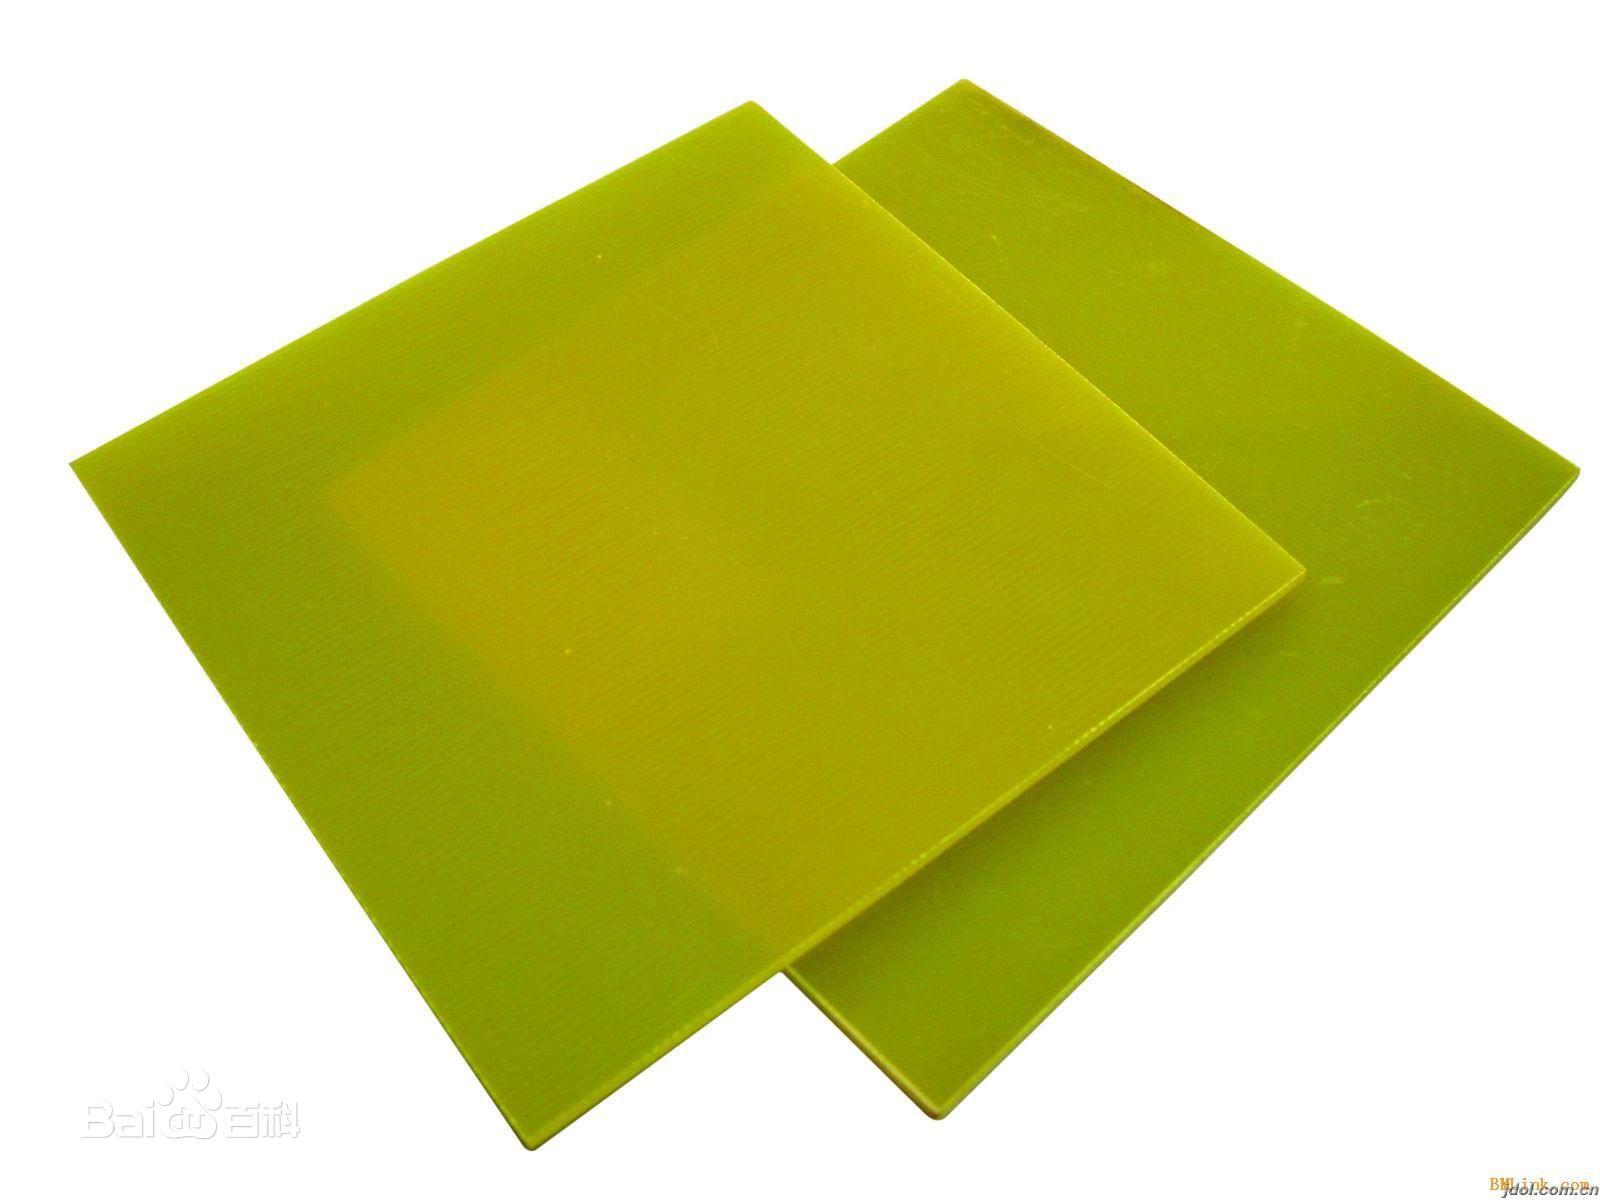 Epoxy 3240 yellow